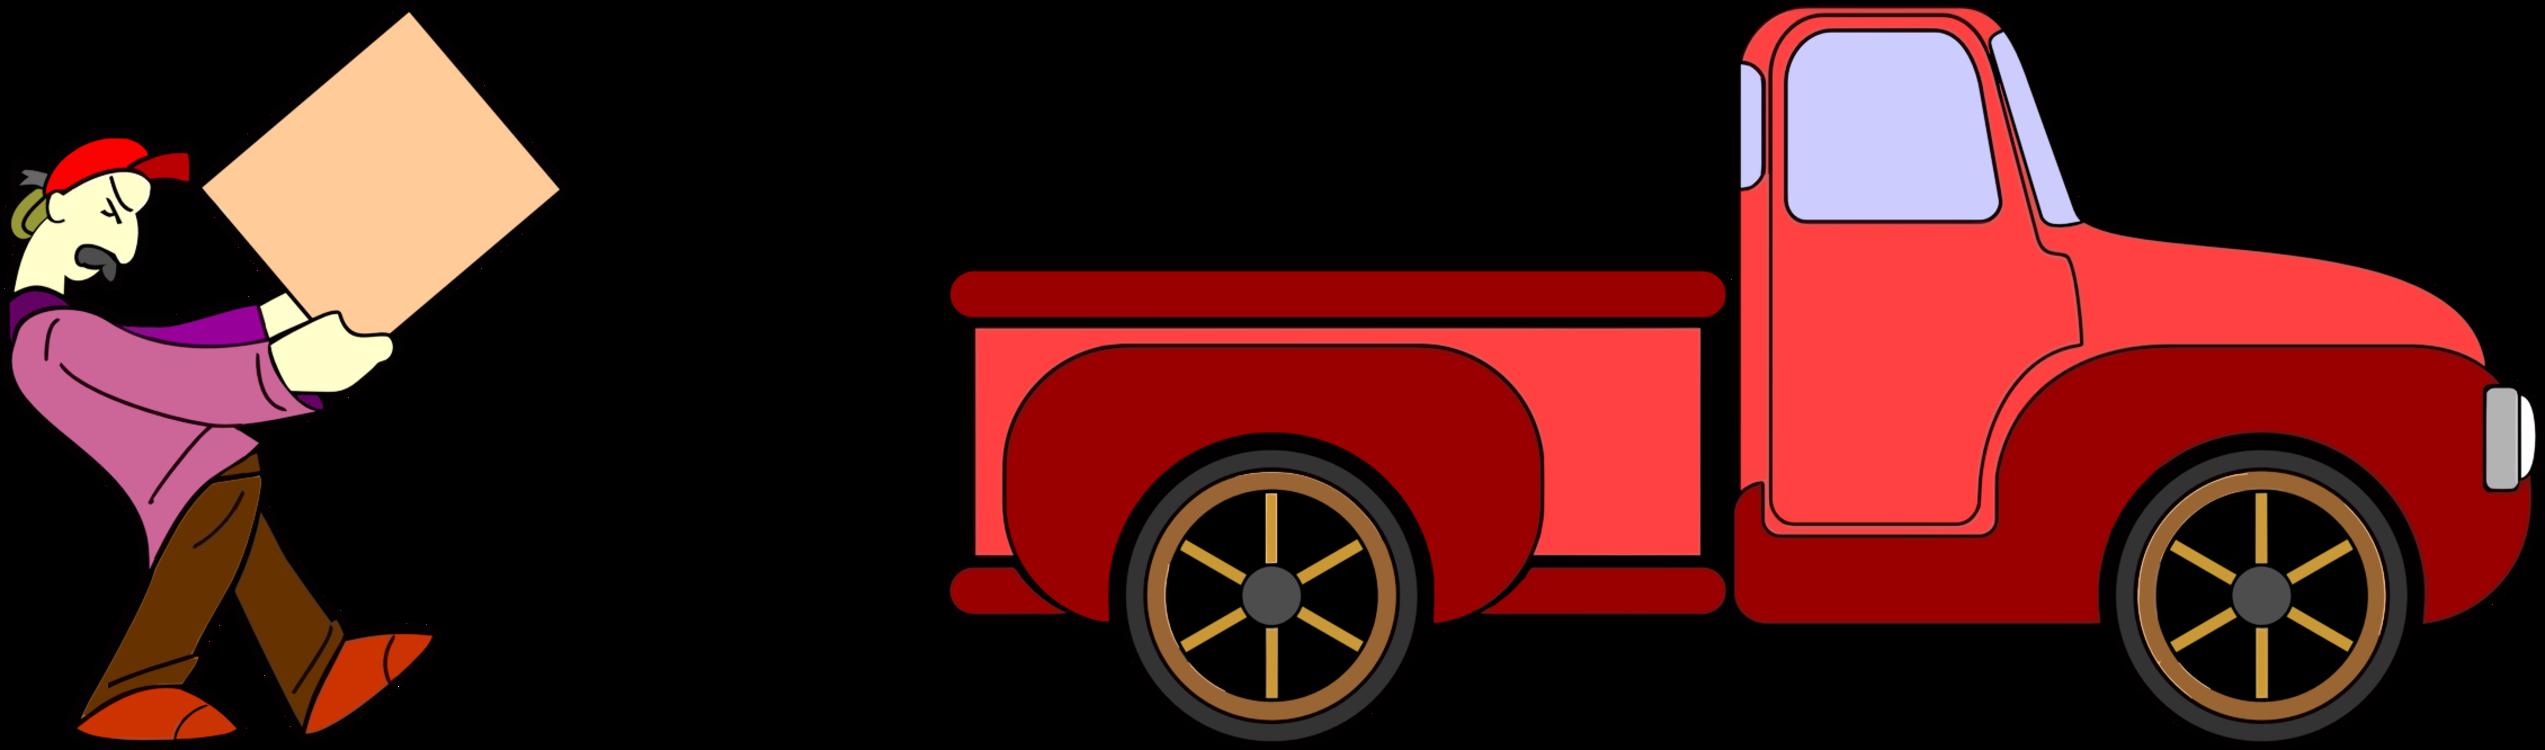 Car,Motor Vehicle,Fictional Character